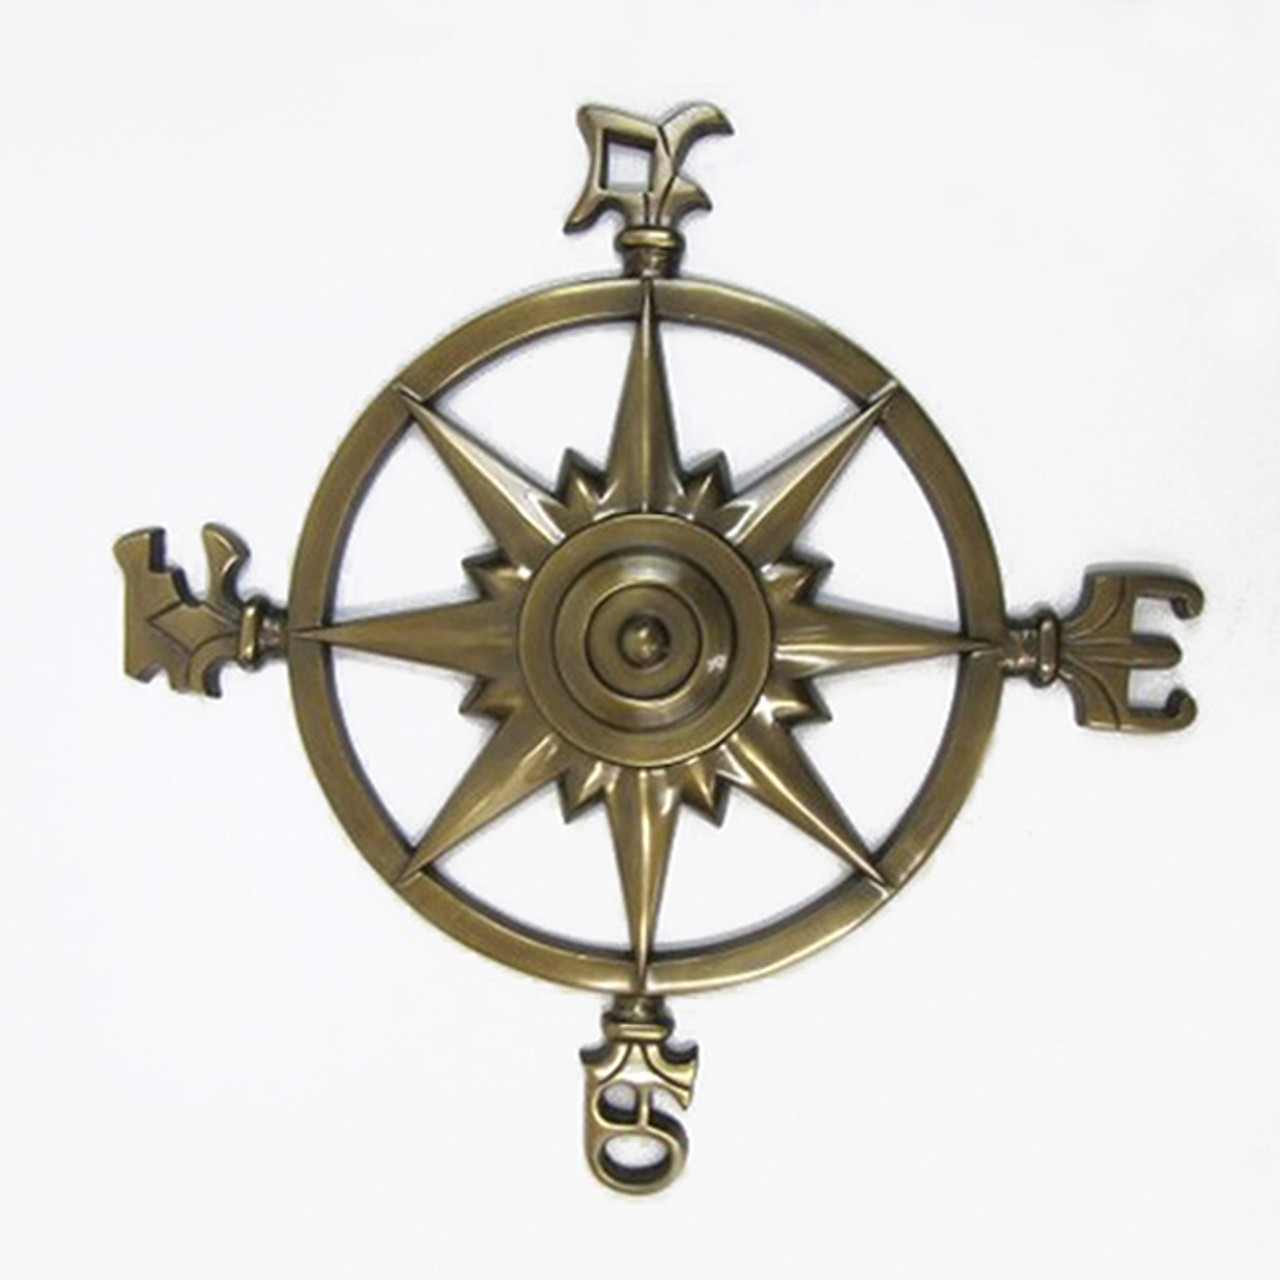 "XL Compass Rose Windrose Brass Finish 23"" Nautical Wall Decor"